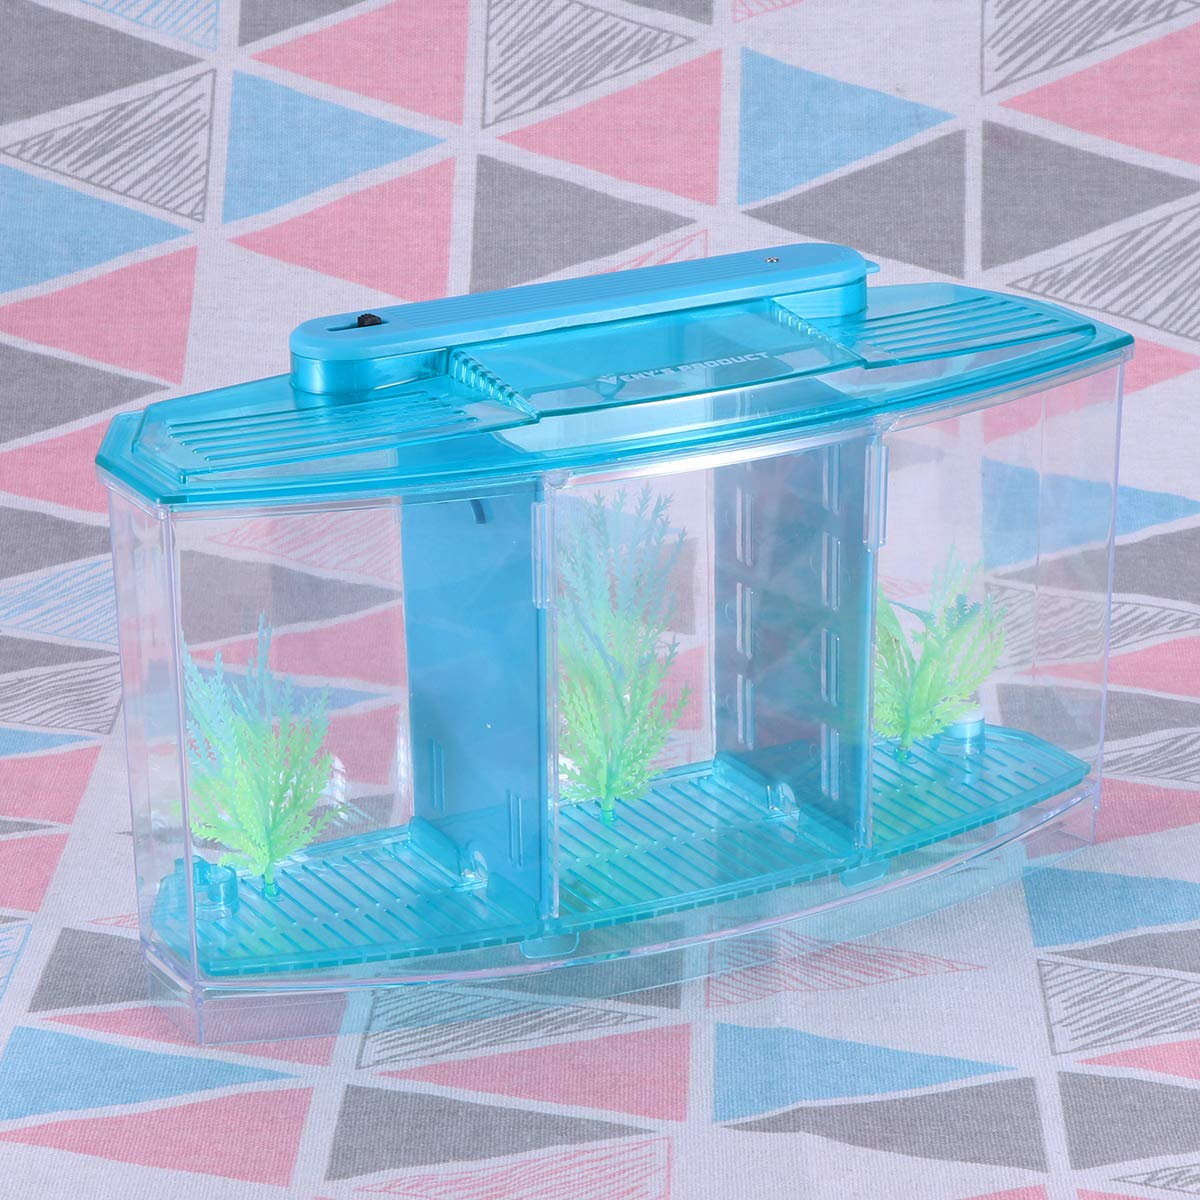 POPETPOP Mini Desktop Aquariums Fish Tank Ecological Goldfish Tank Hatchery Breeder Box for Living Office and Home dÃcor(Blue) by POPETPOP (Image #7)